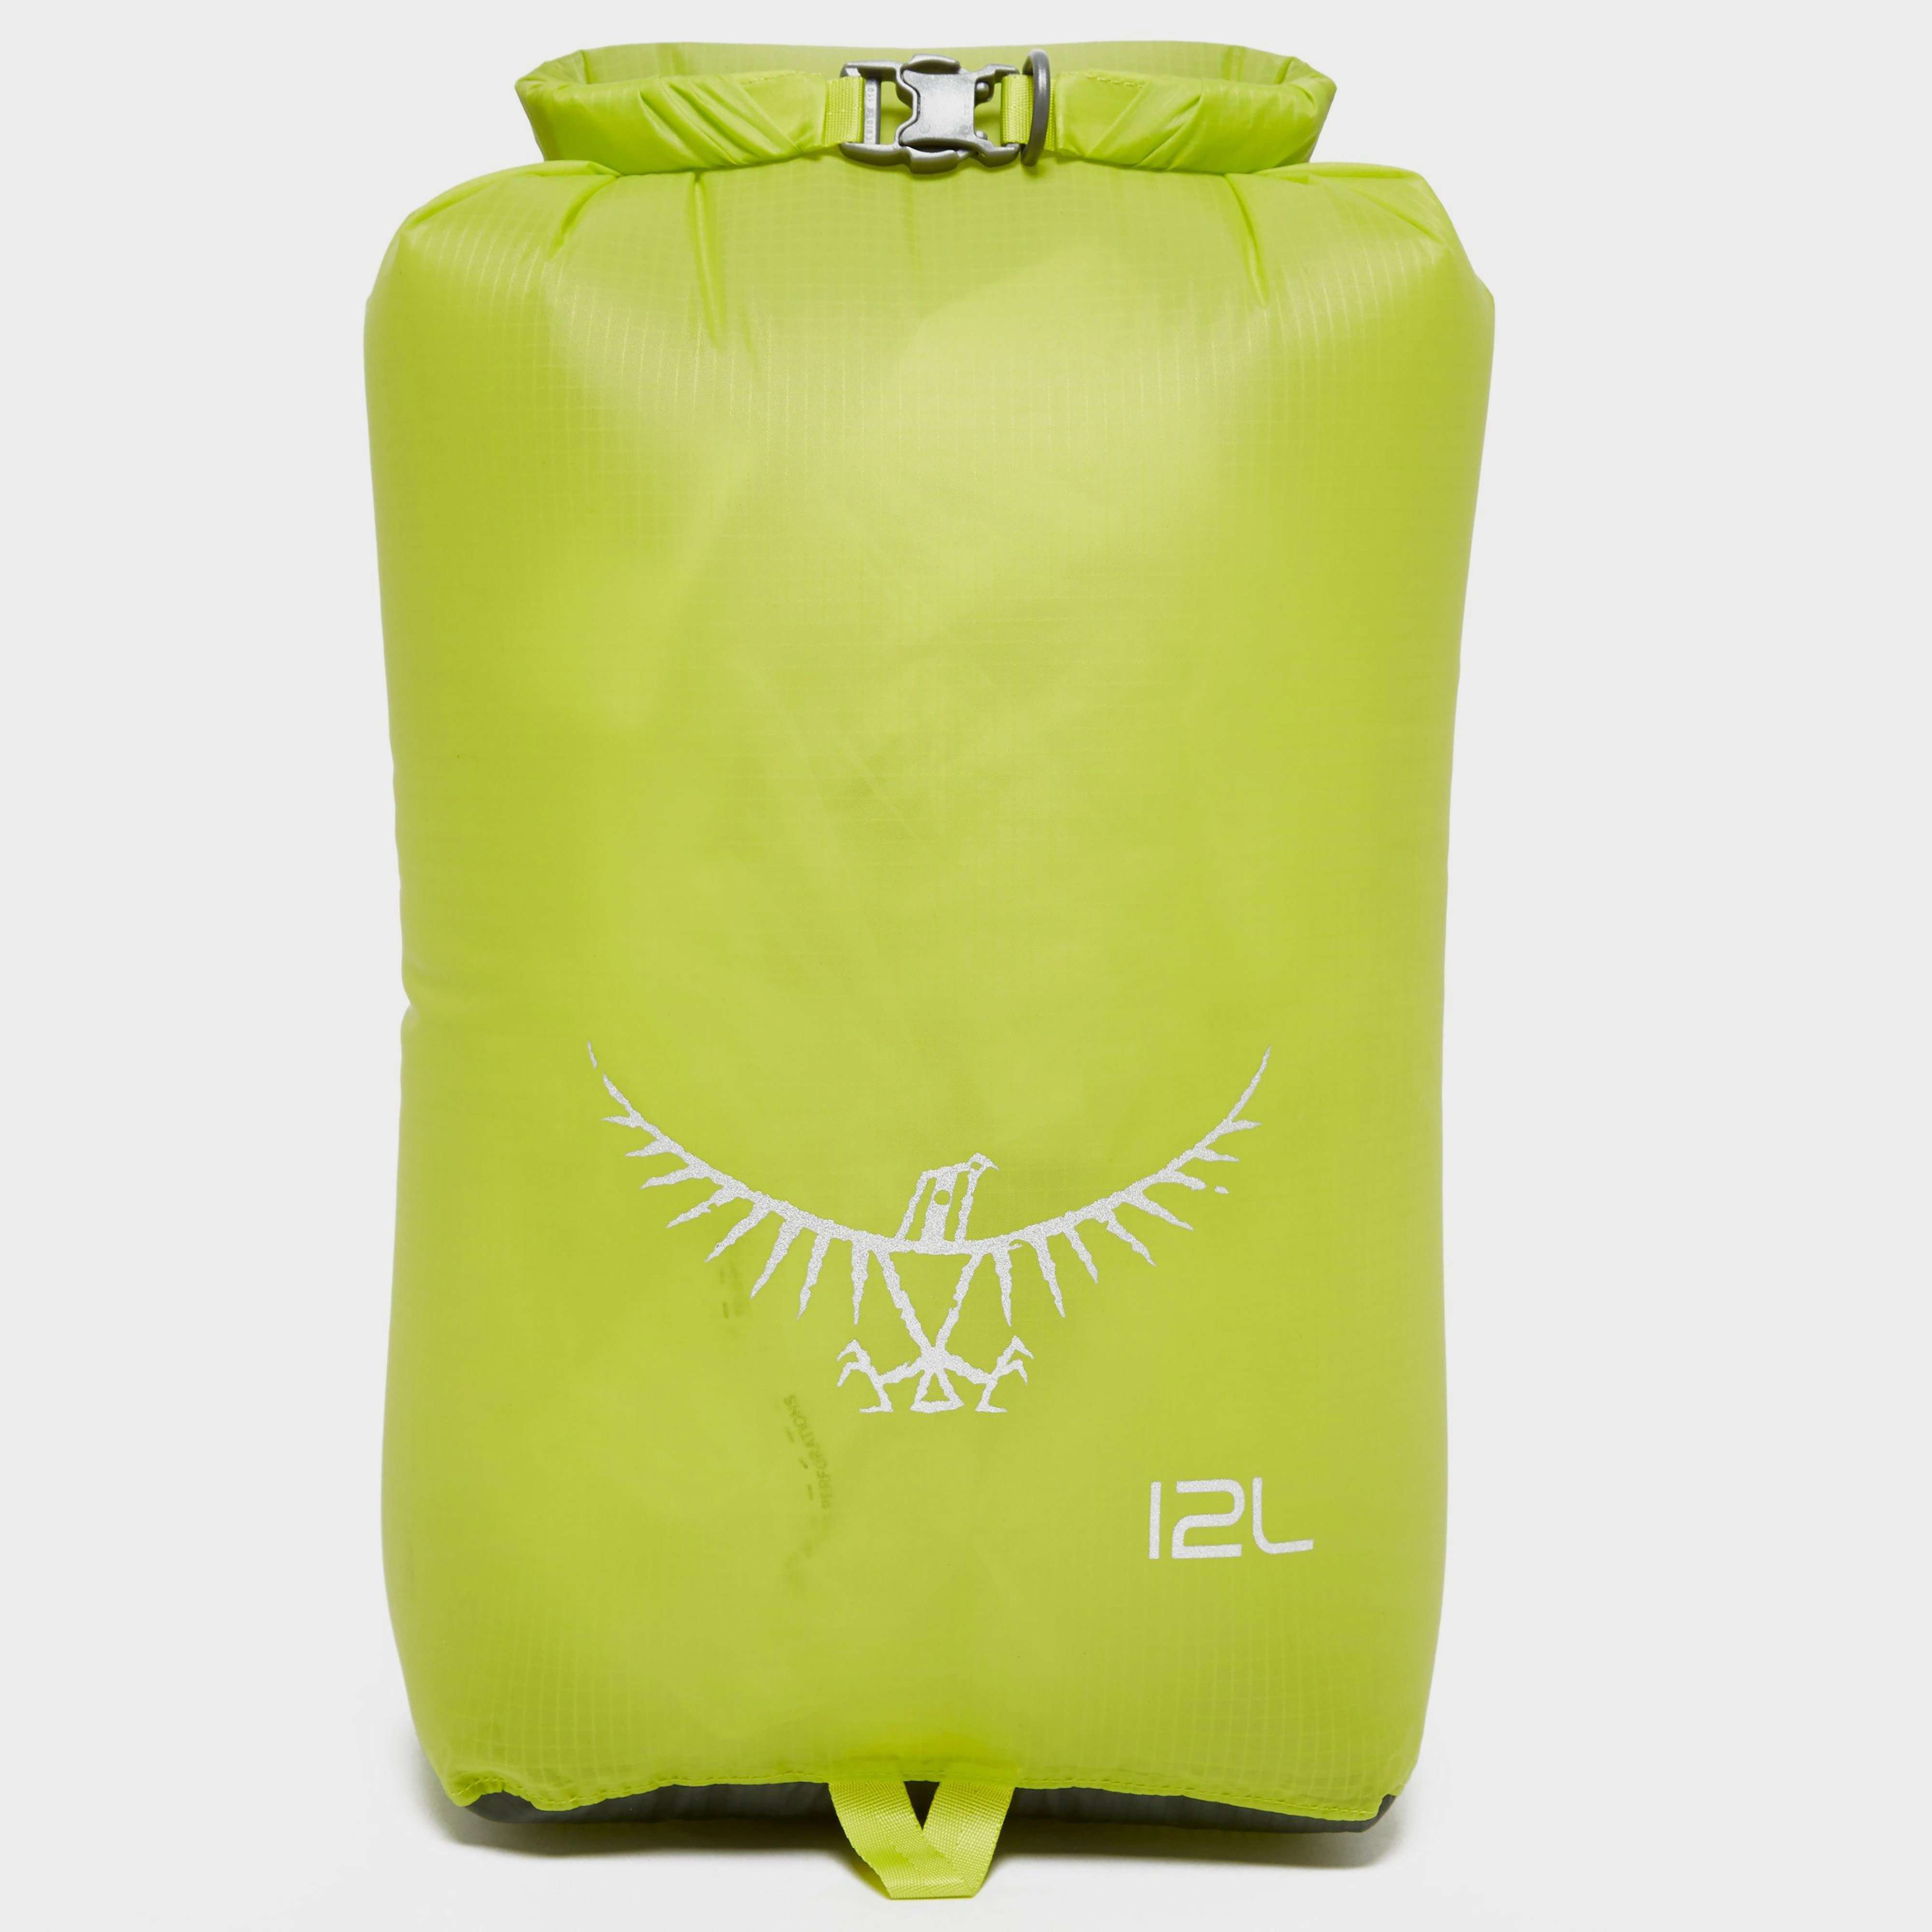 OSPREY Ultralight Drysack 12L